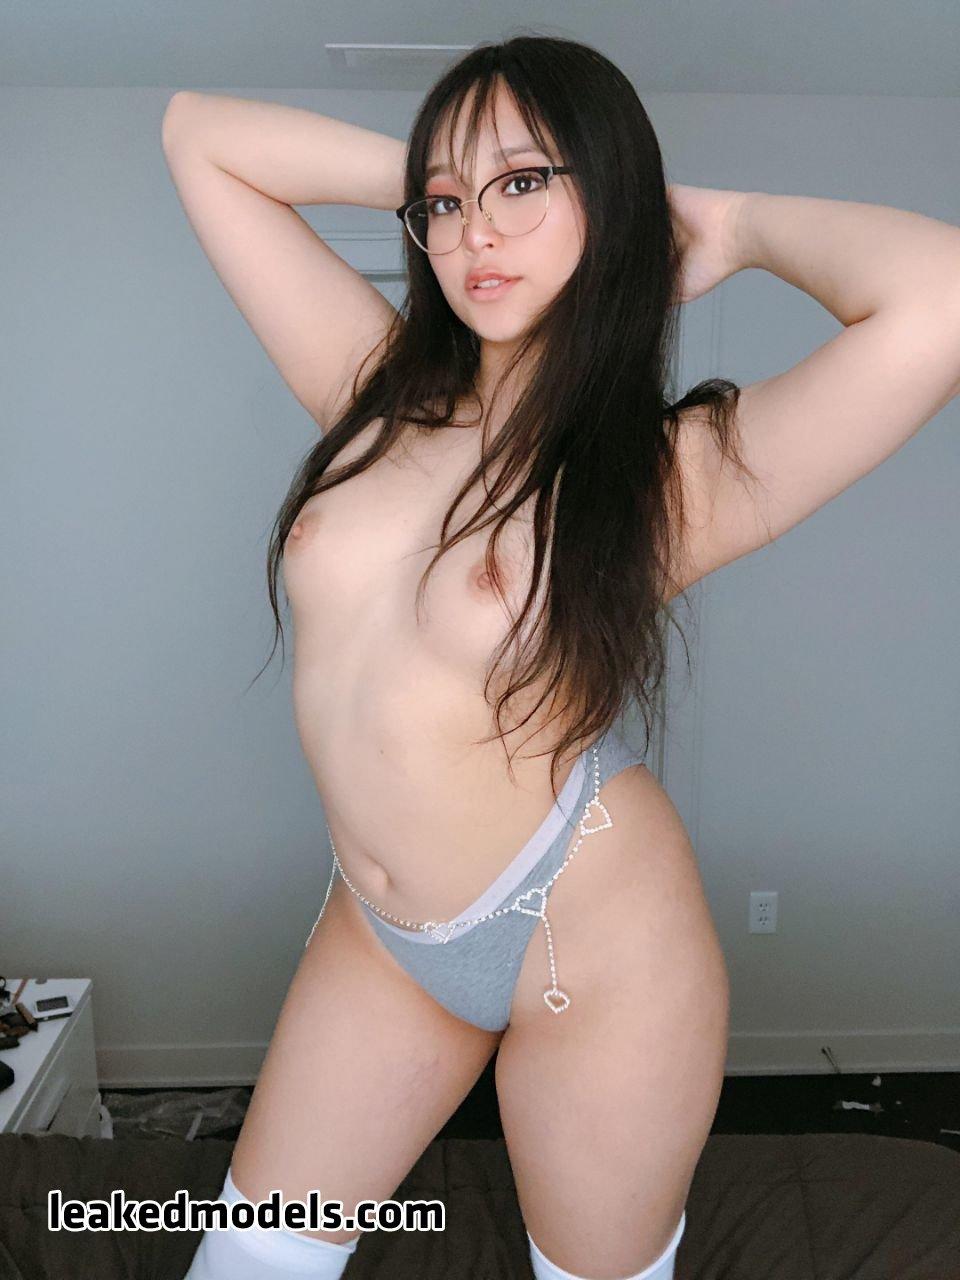 Thananya Ninkaeo – Ambiiyah OnlyFans Nude Leaks (25 Photos)